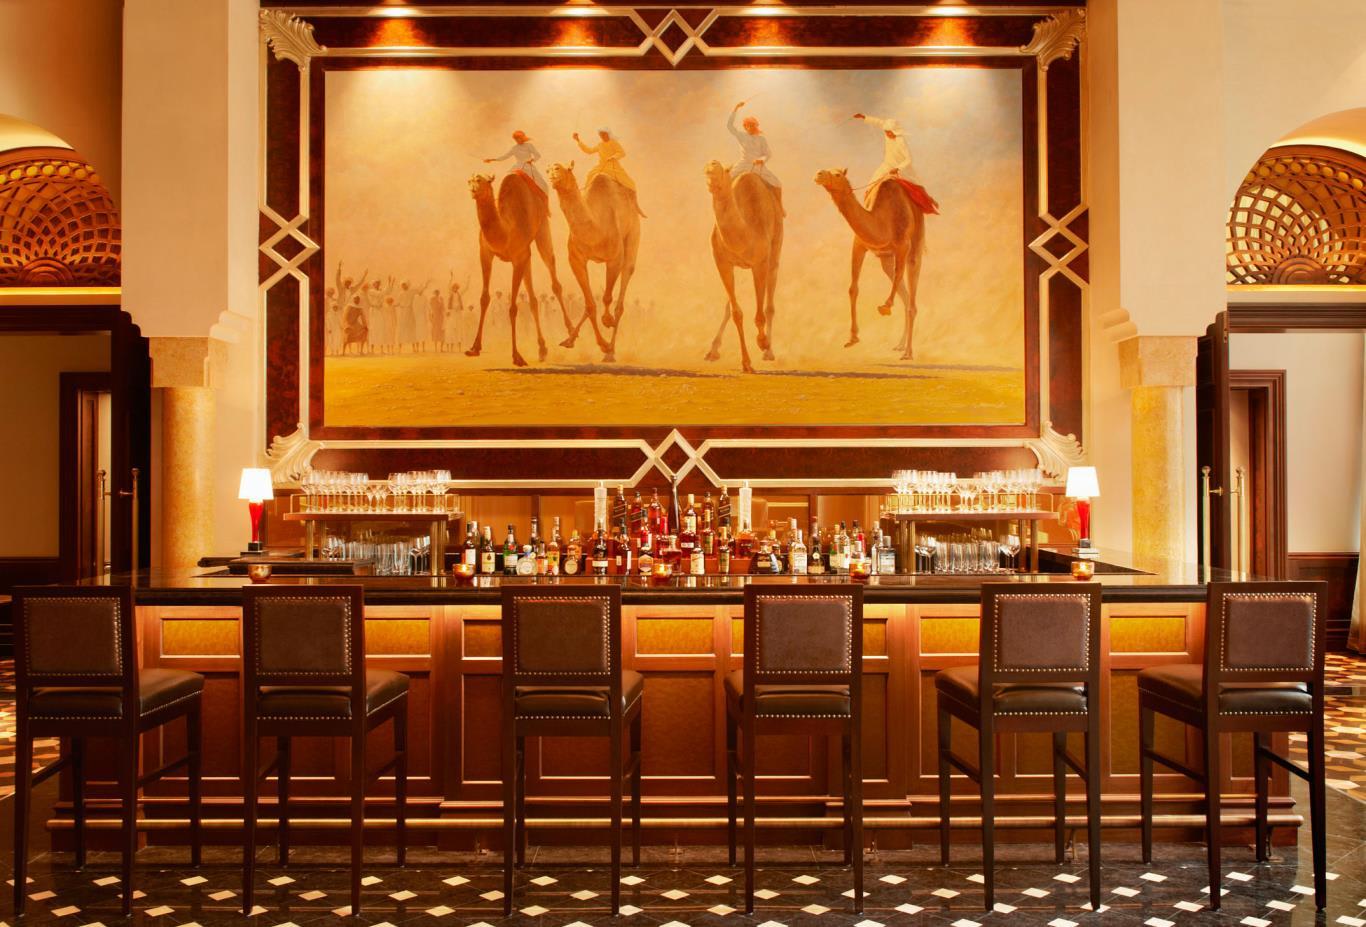 The St Regis Bar